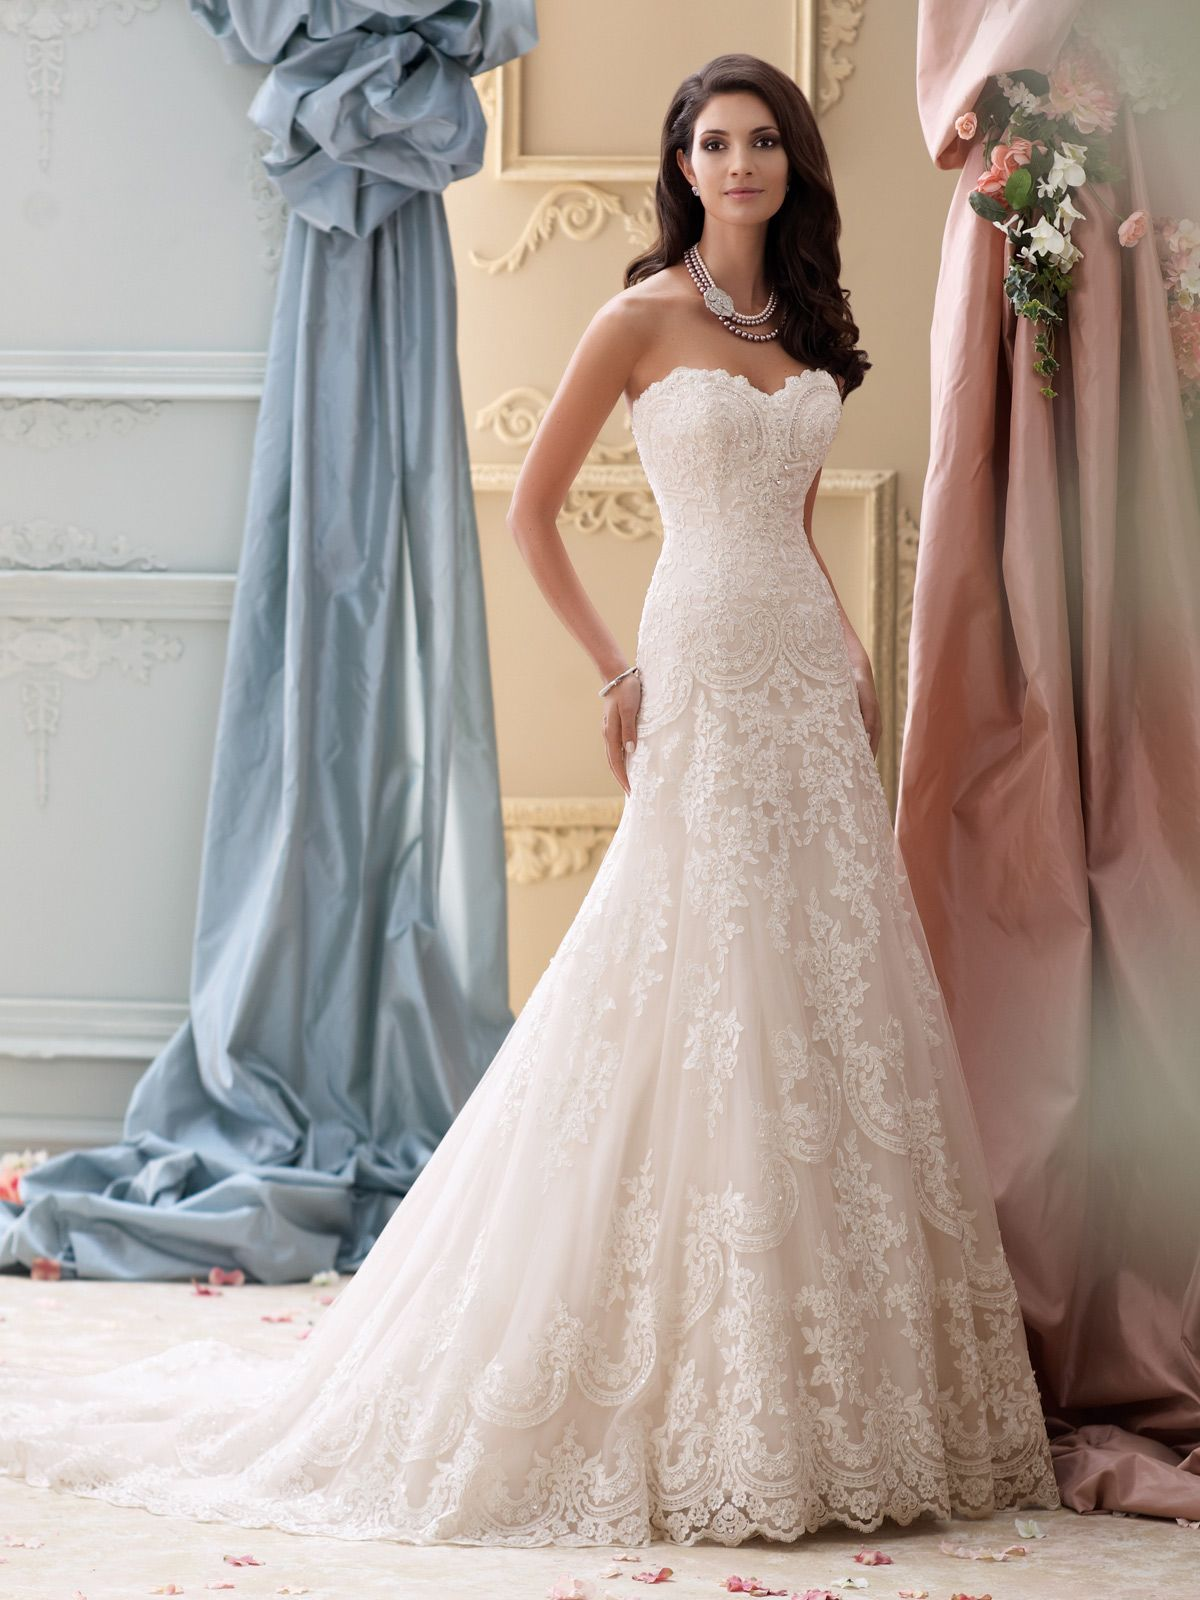 Wedding Dress Www.wedding Dresses 2015 1000 images about wedding dresses on pinterest allure bridal sottero midgley and sincerity dresses